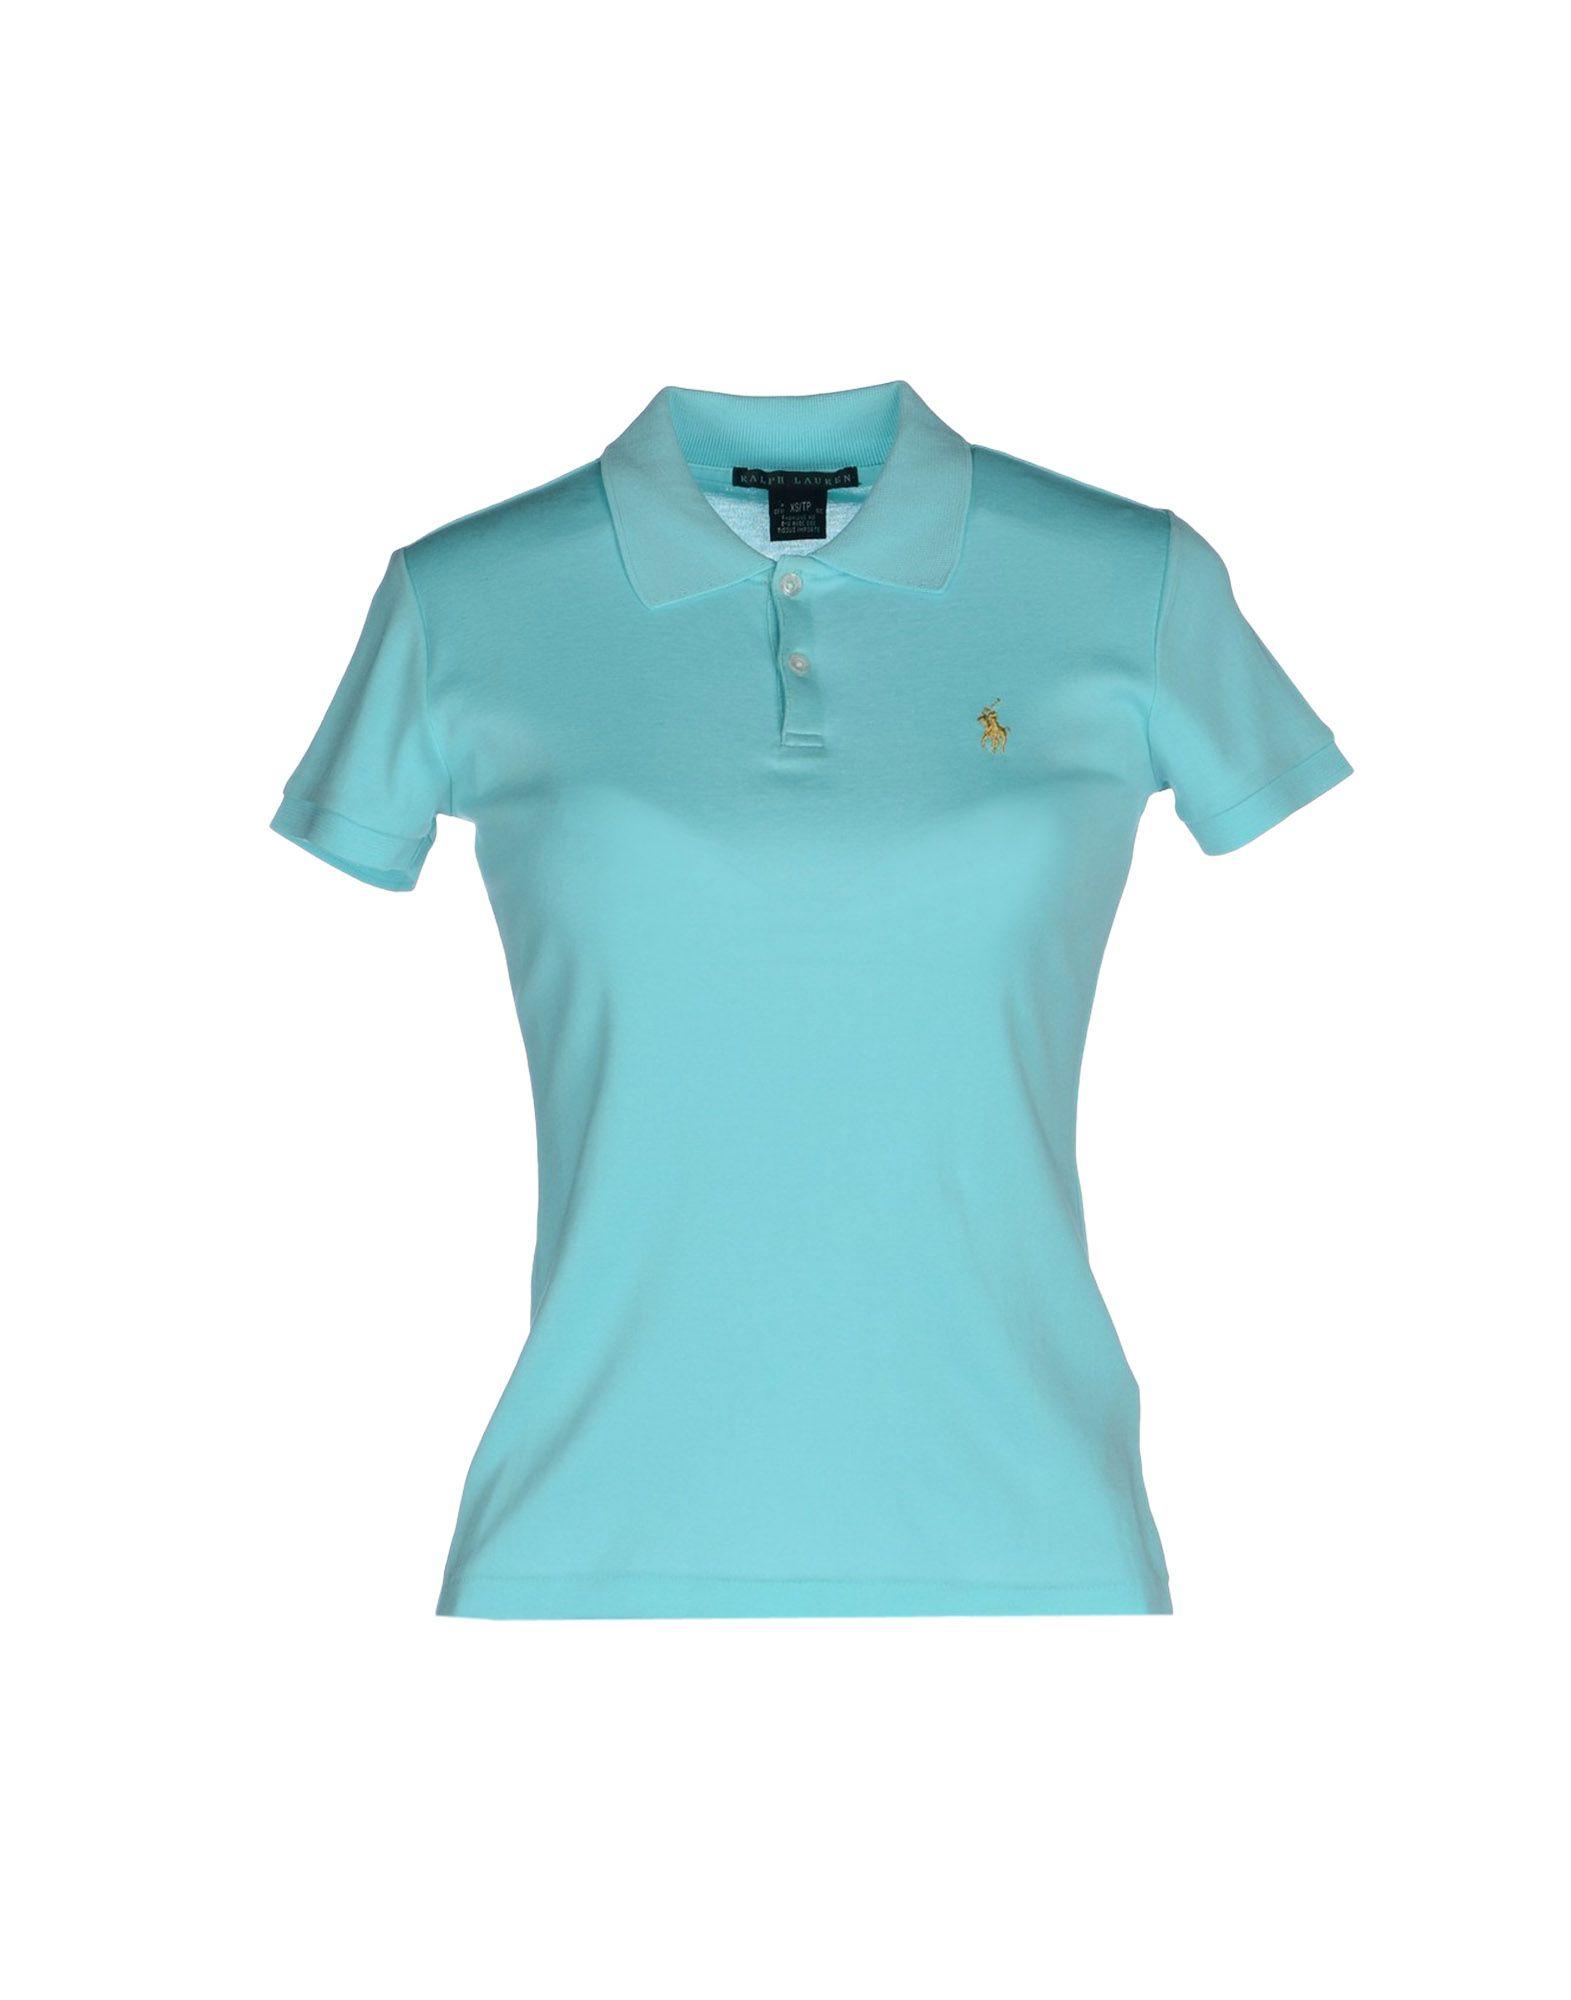 Ralph lauren black label polo shirt in blue turquoise lyst for Ralph lauren black label polo shirt